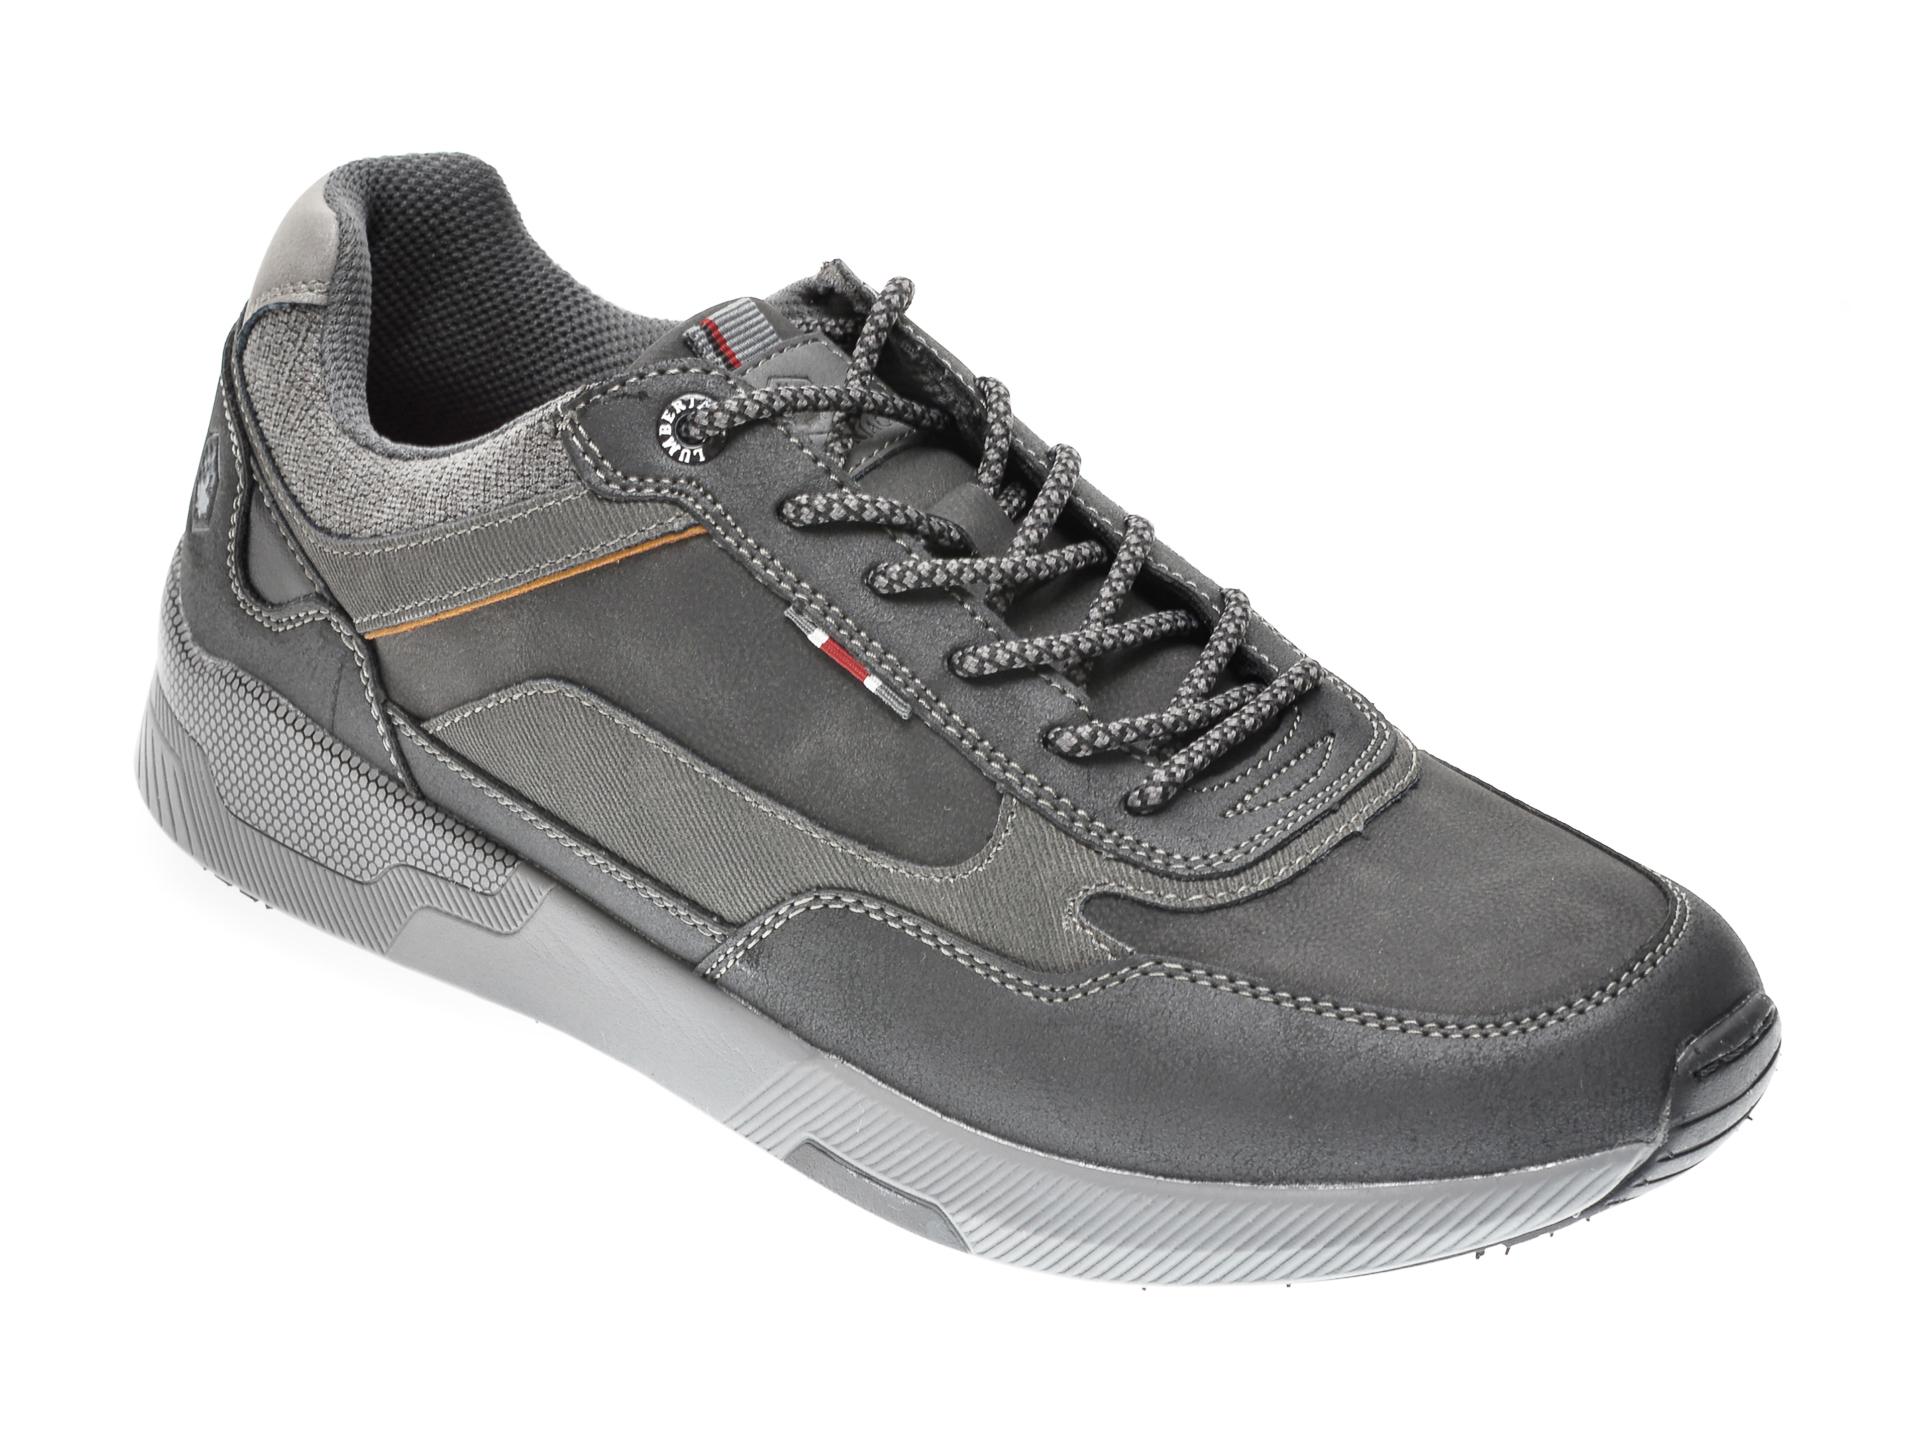 Pantofi Sport Lumberjack Negri, 412004, Din Piele Ecologica